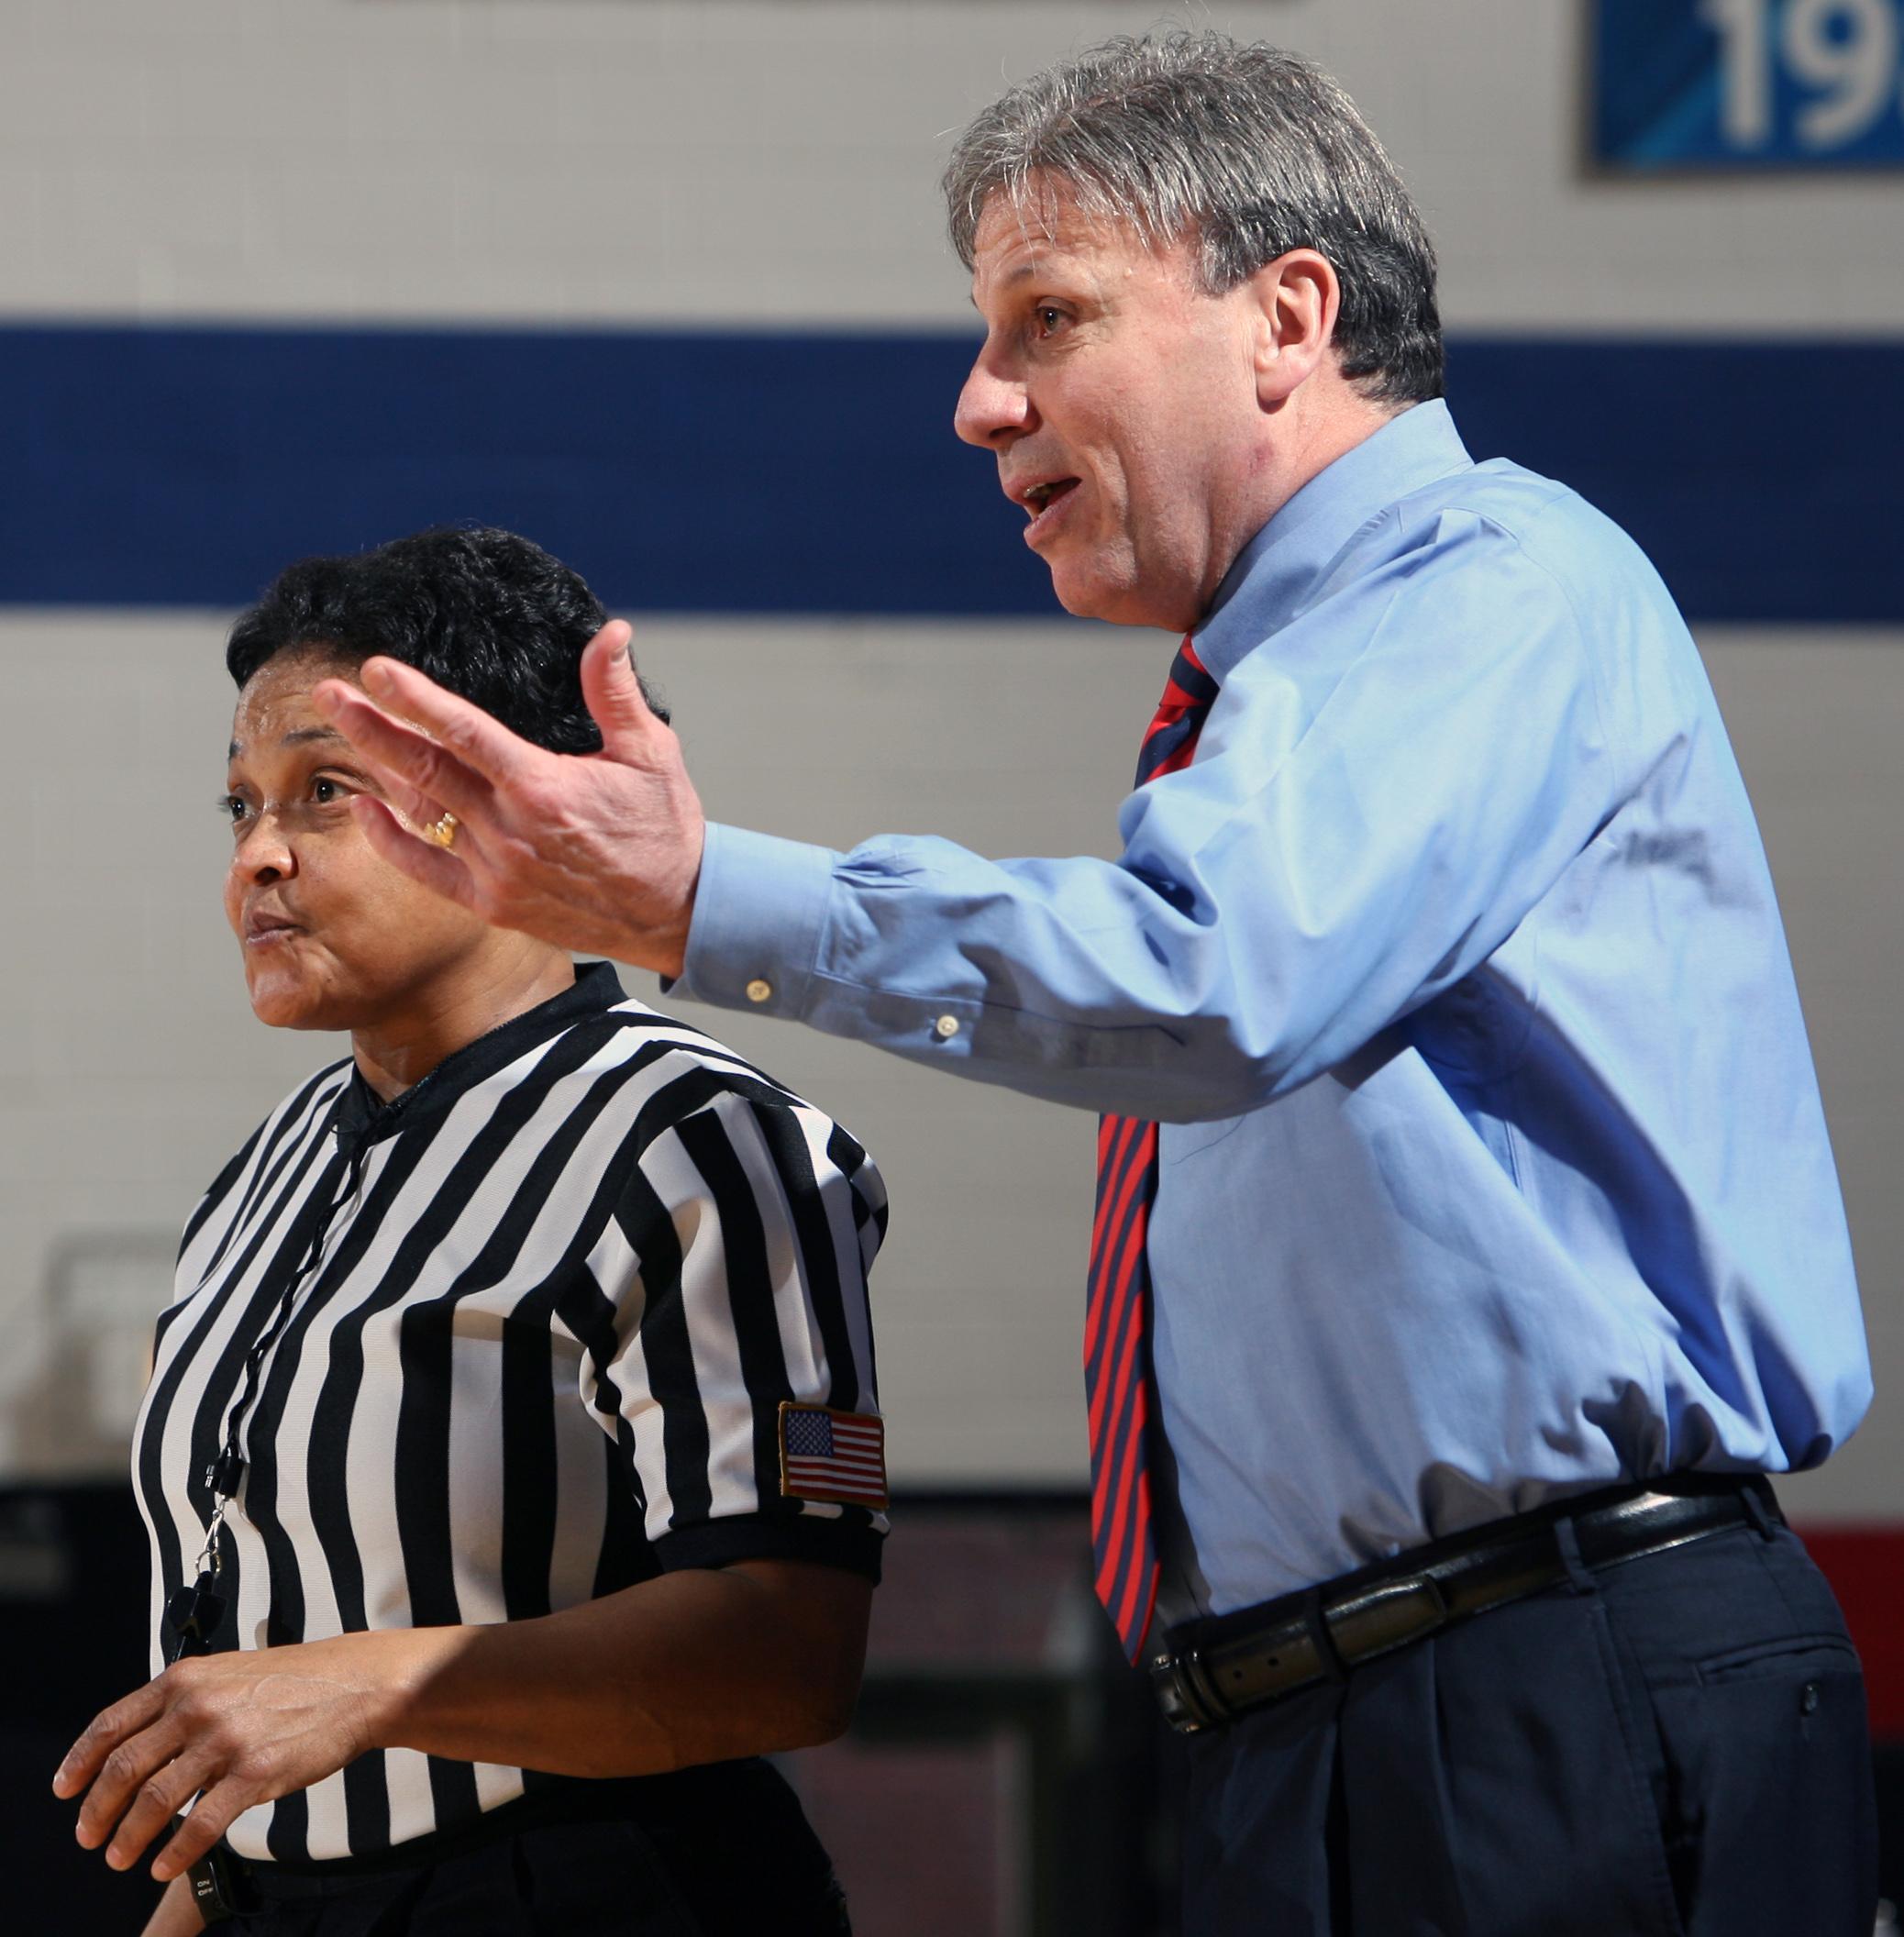 Women's basketball official Bonita Spence dies